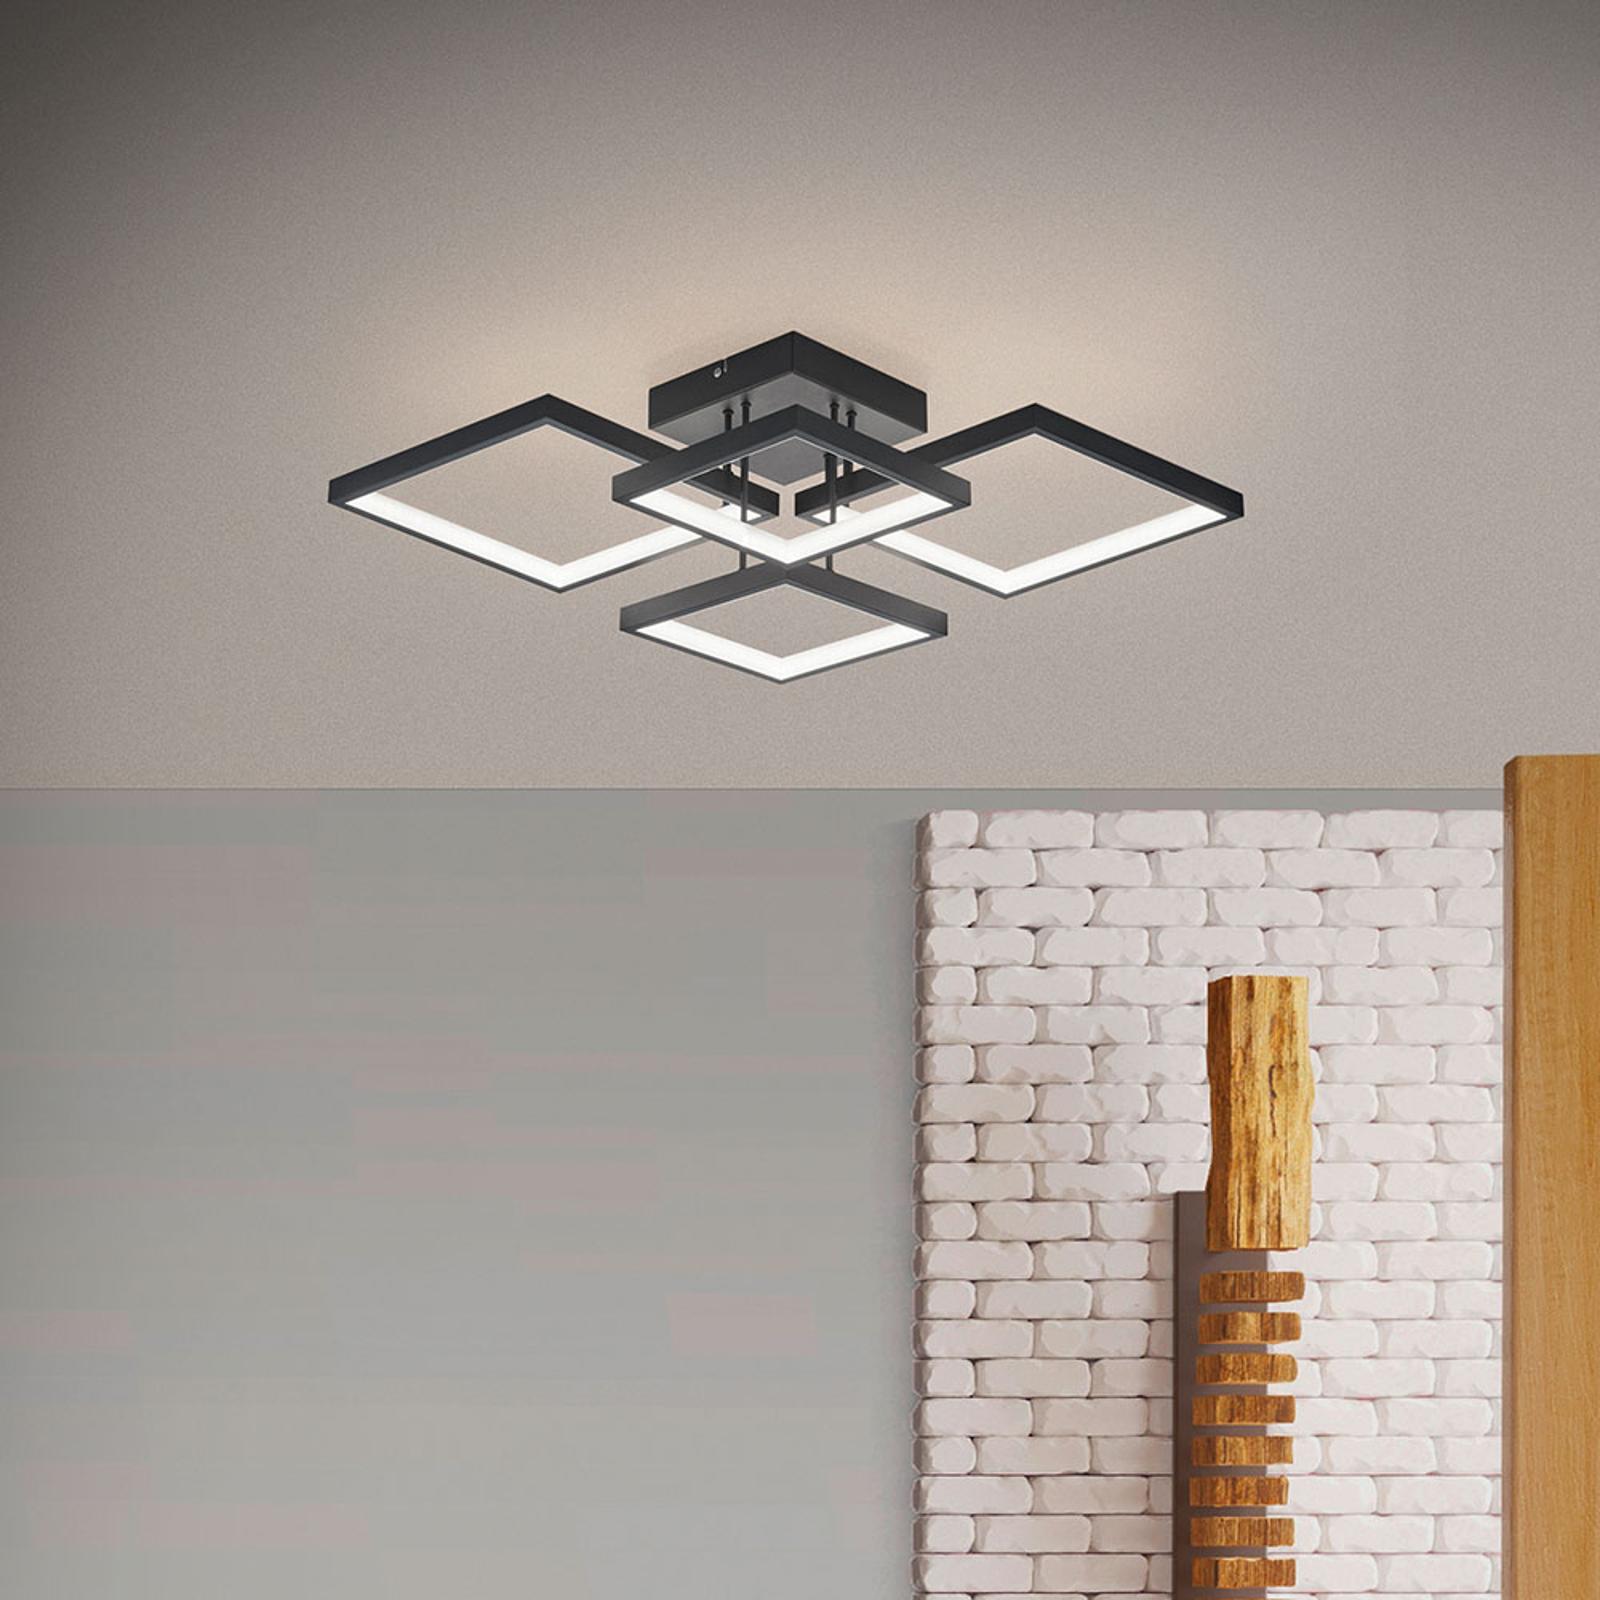 LED-taklampa Sorrento 52 x 52 cm, svart matt